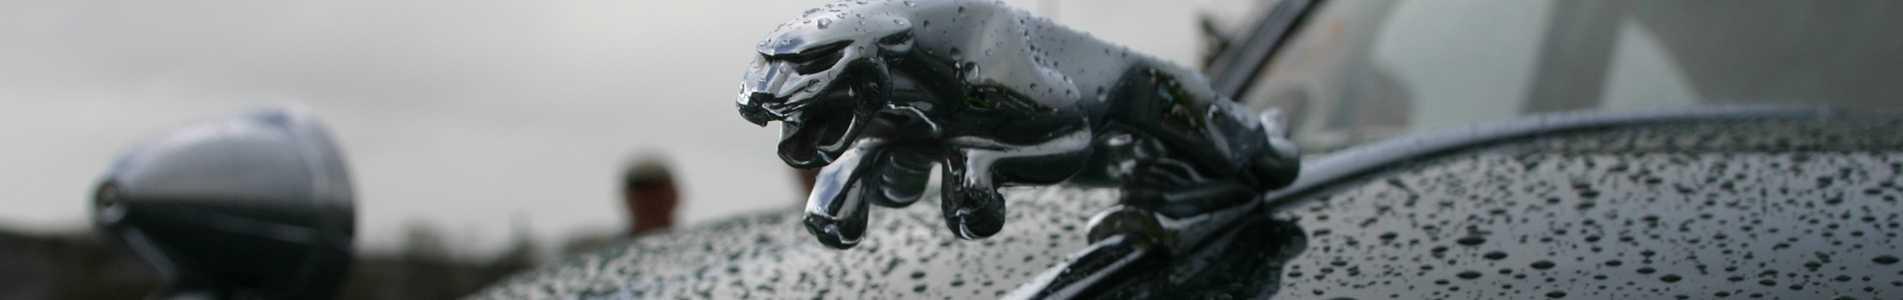 cabecera-jaguar